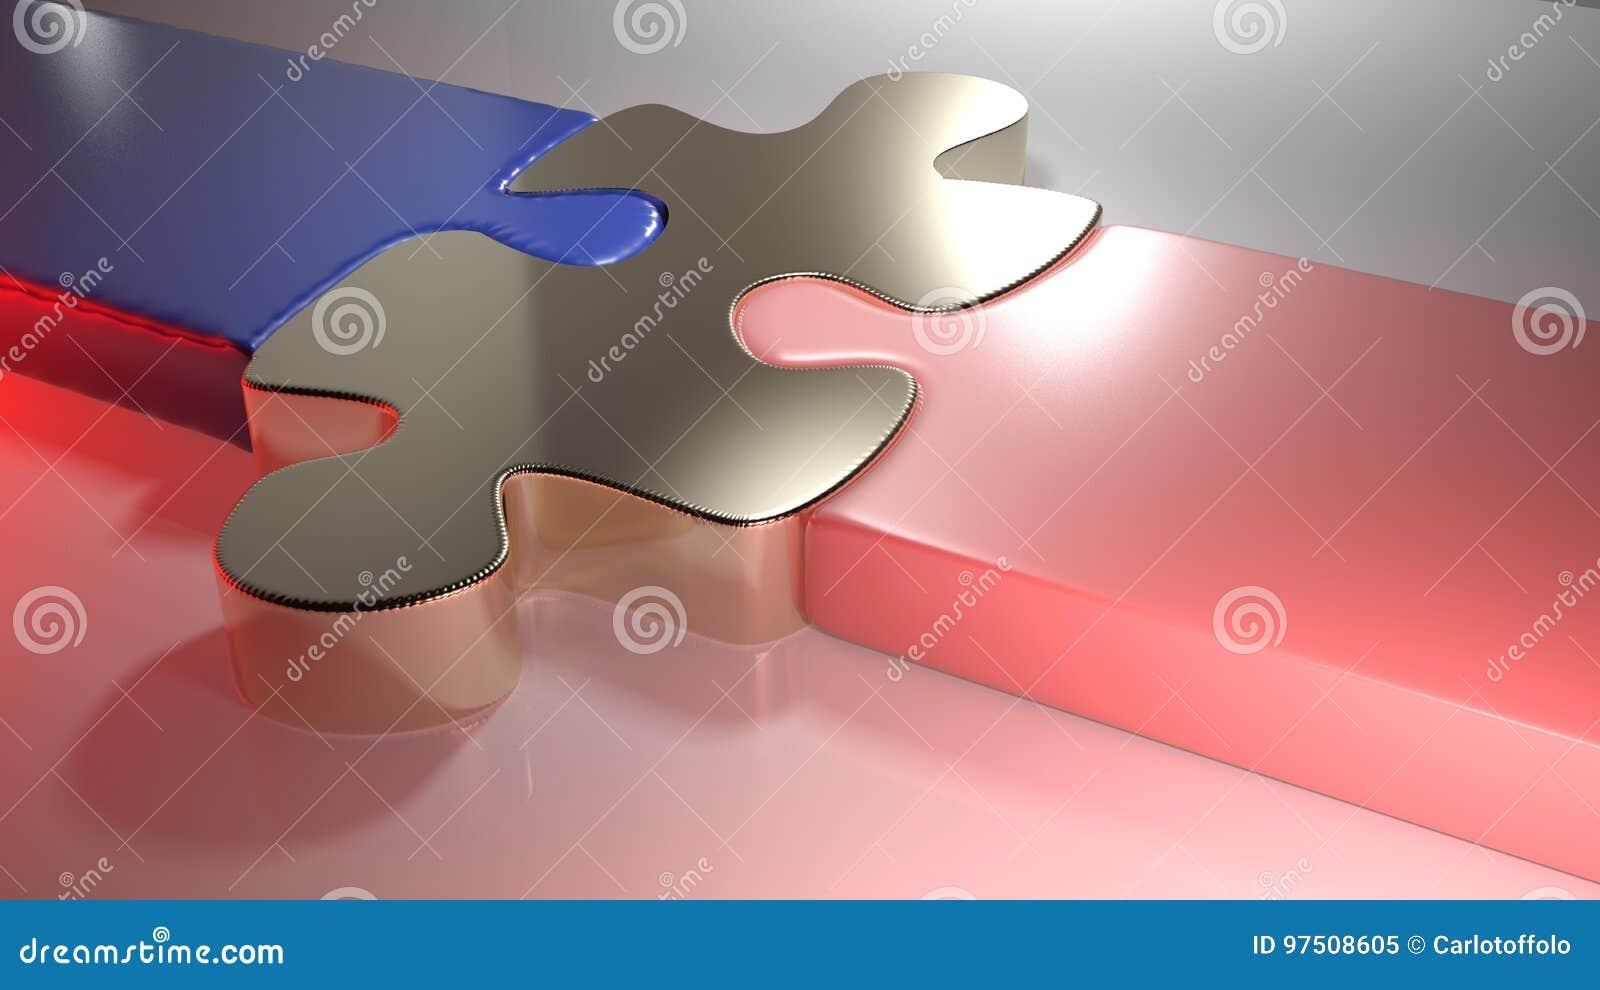 original 3d crystal puzzle swan instructions